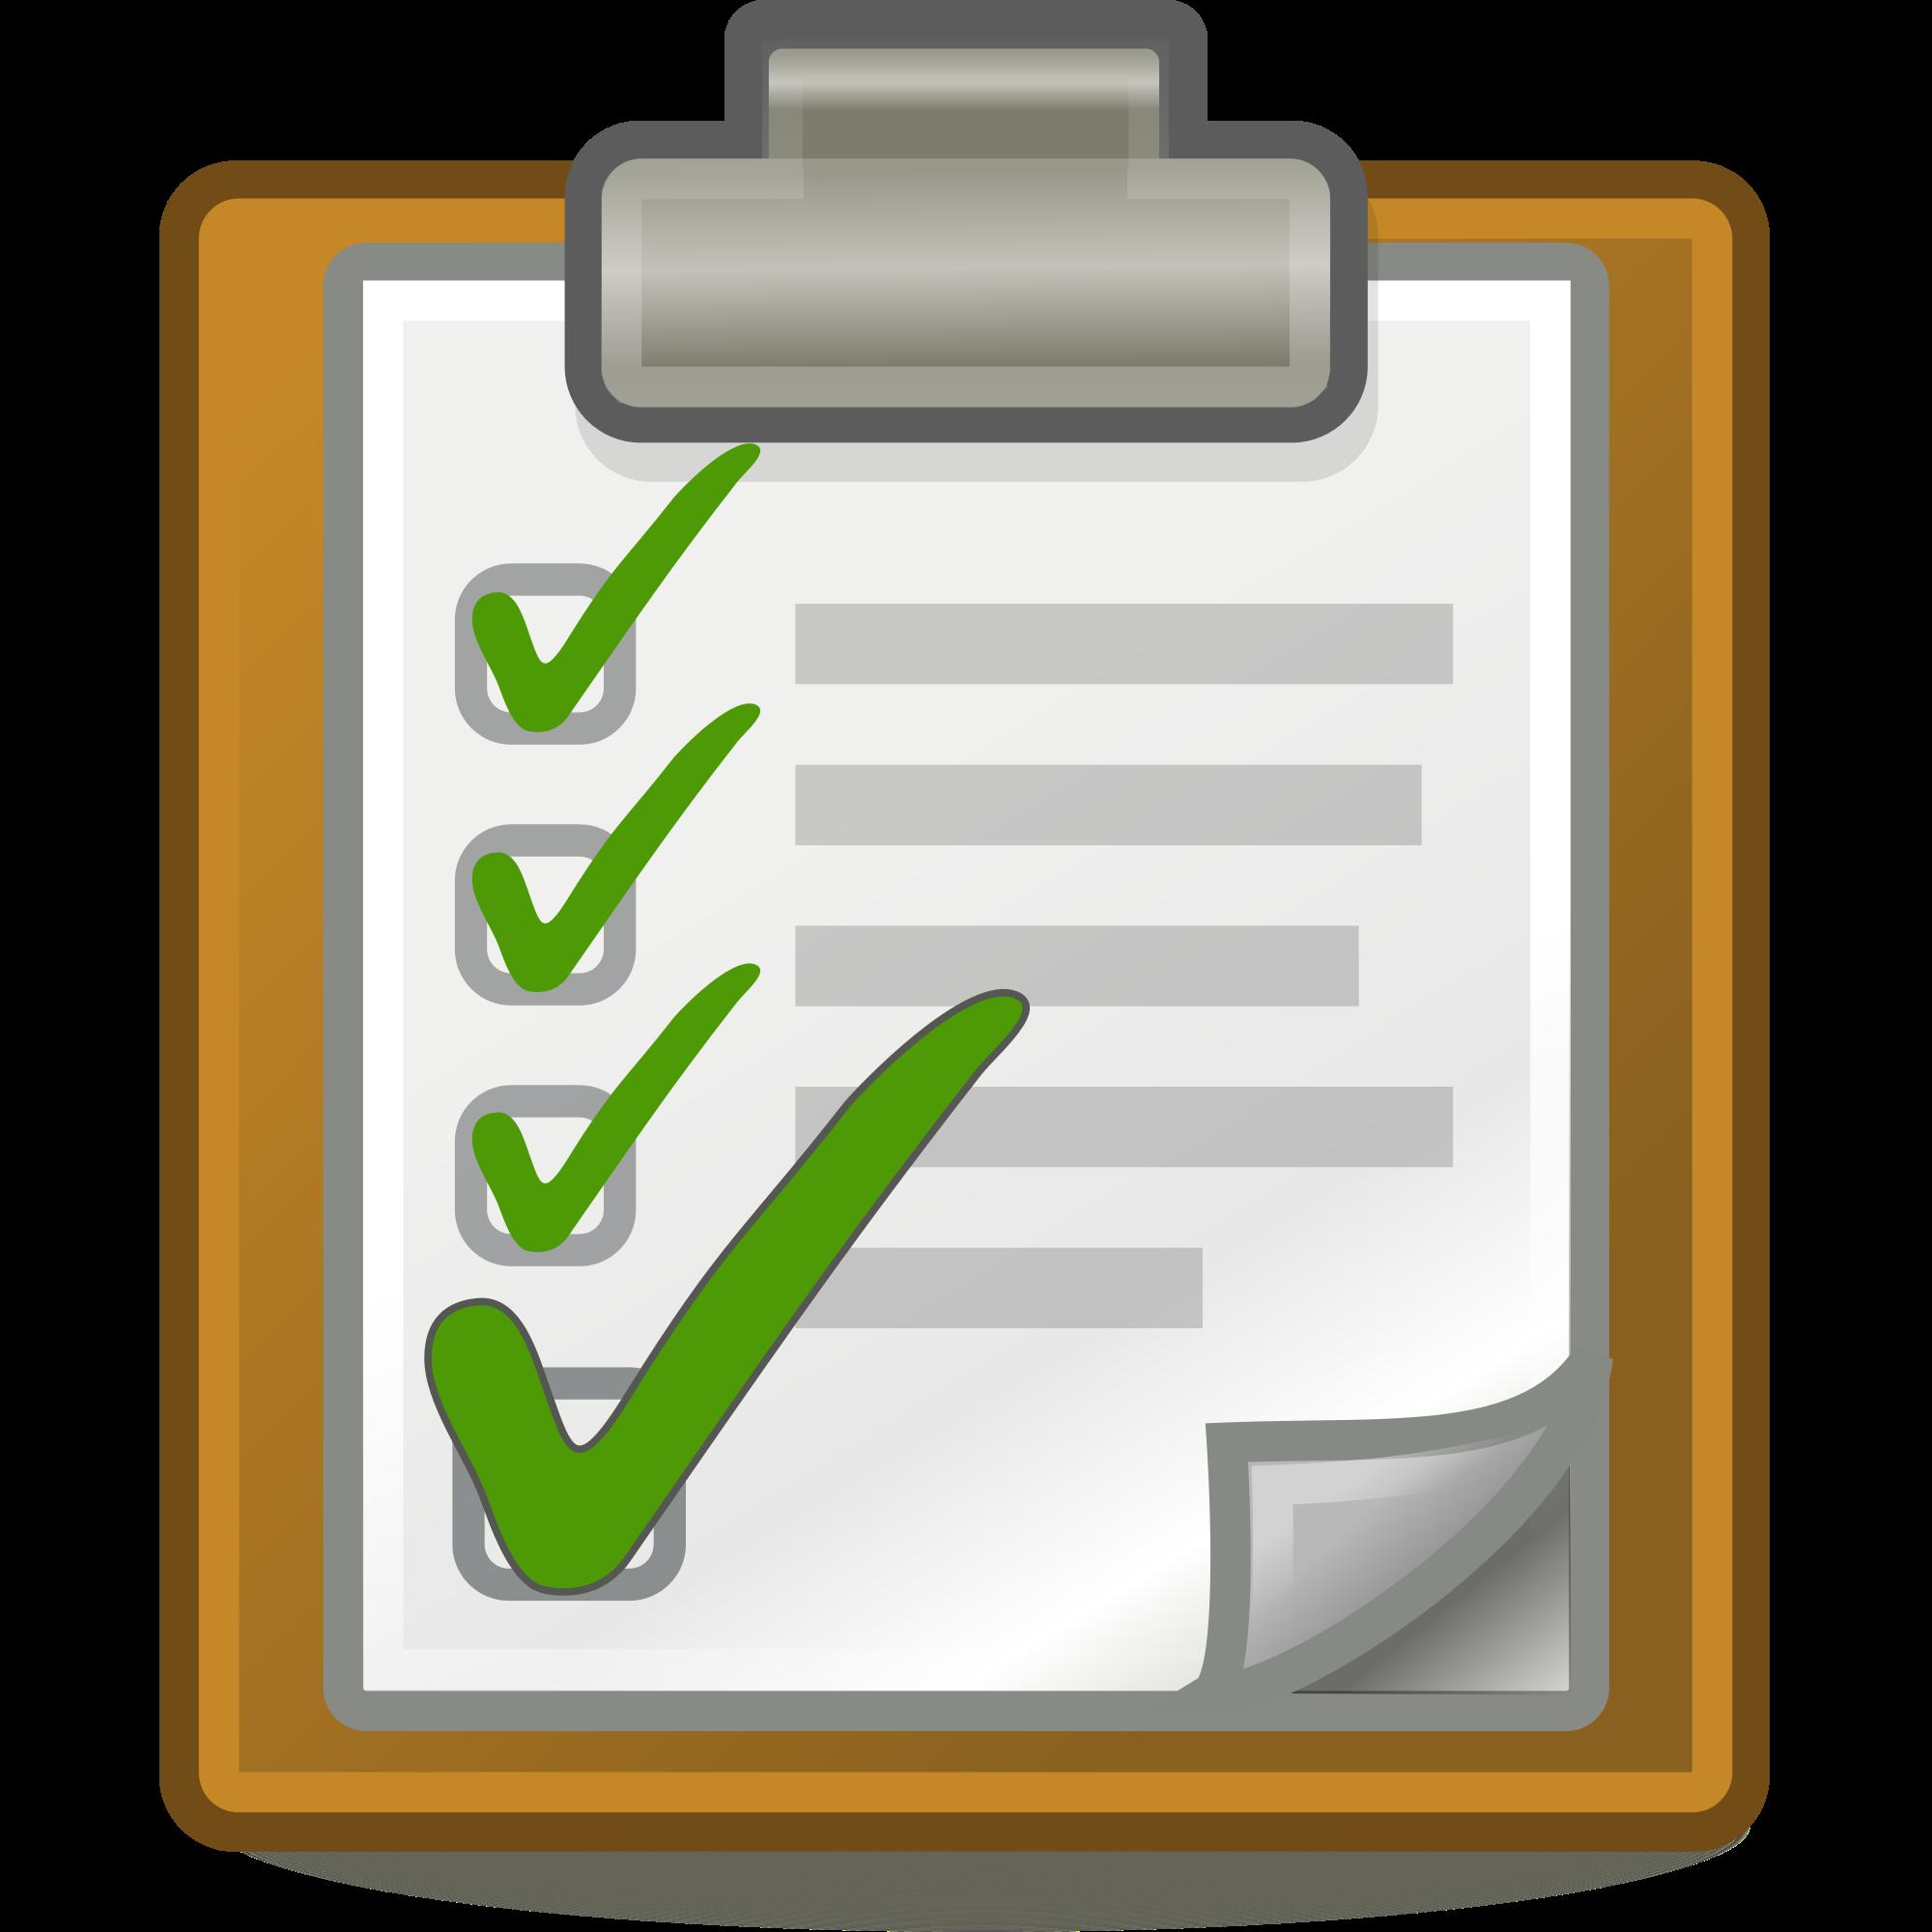 File edit check sheet. Clipboard clipart checksheet